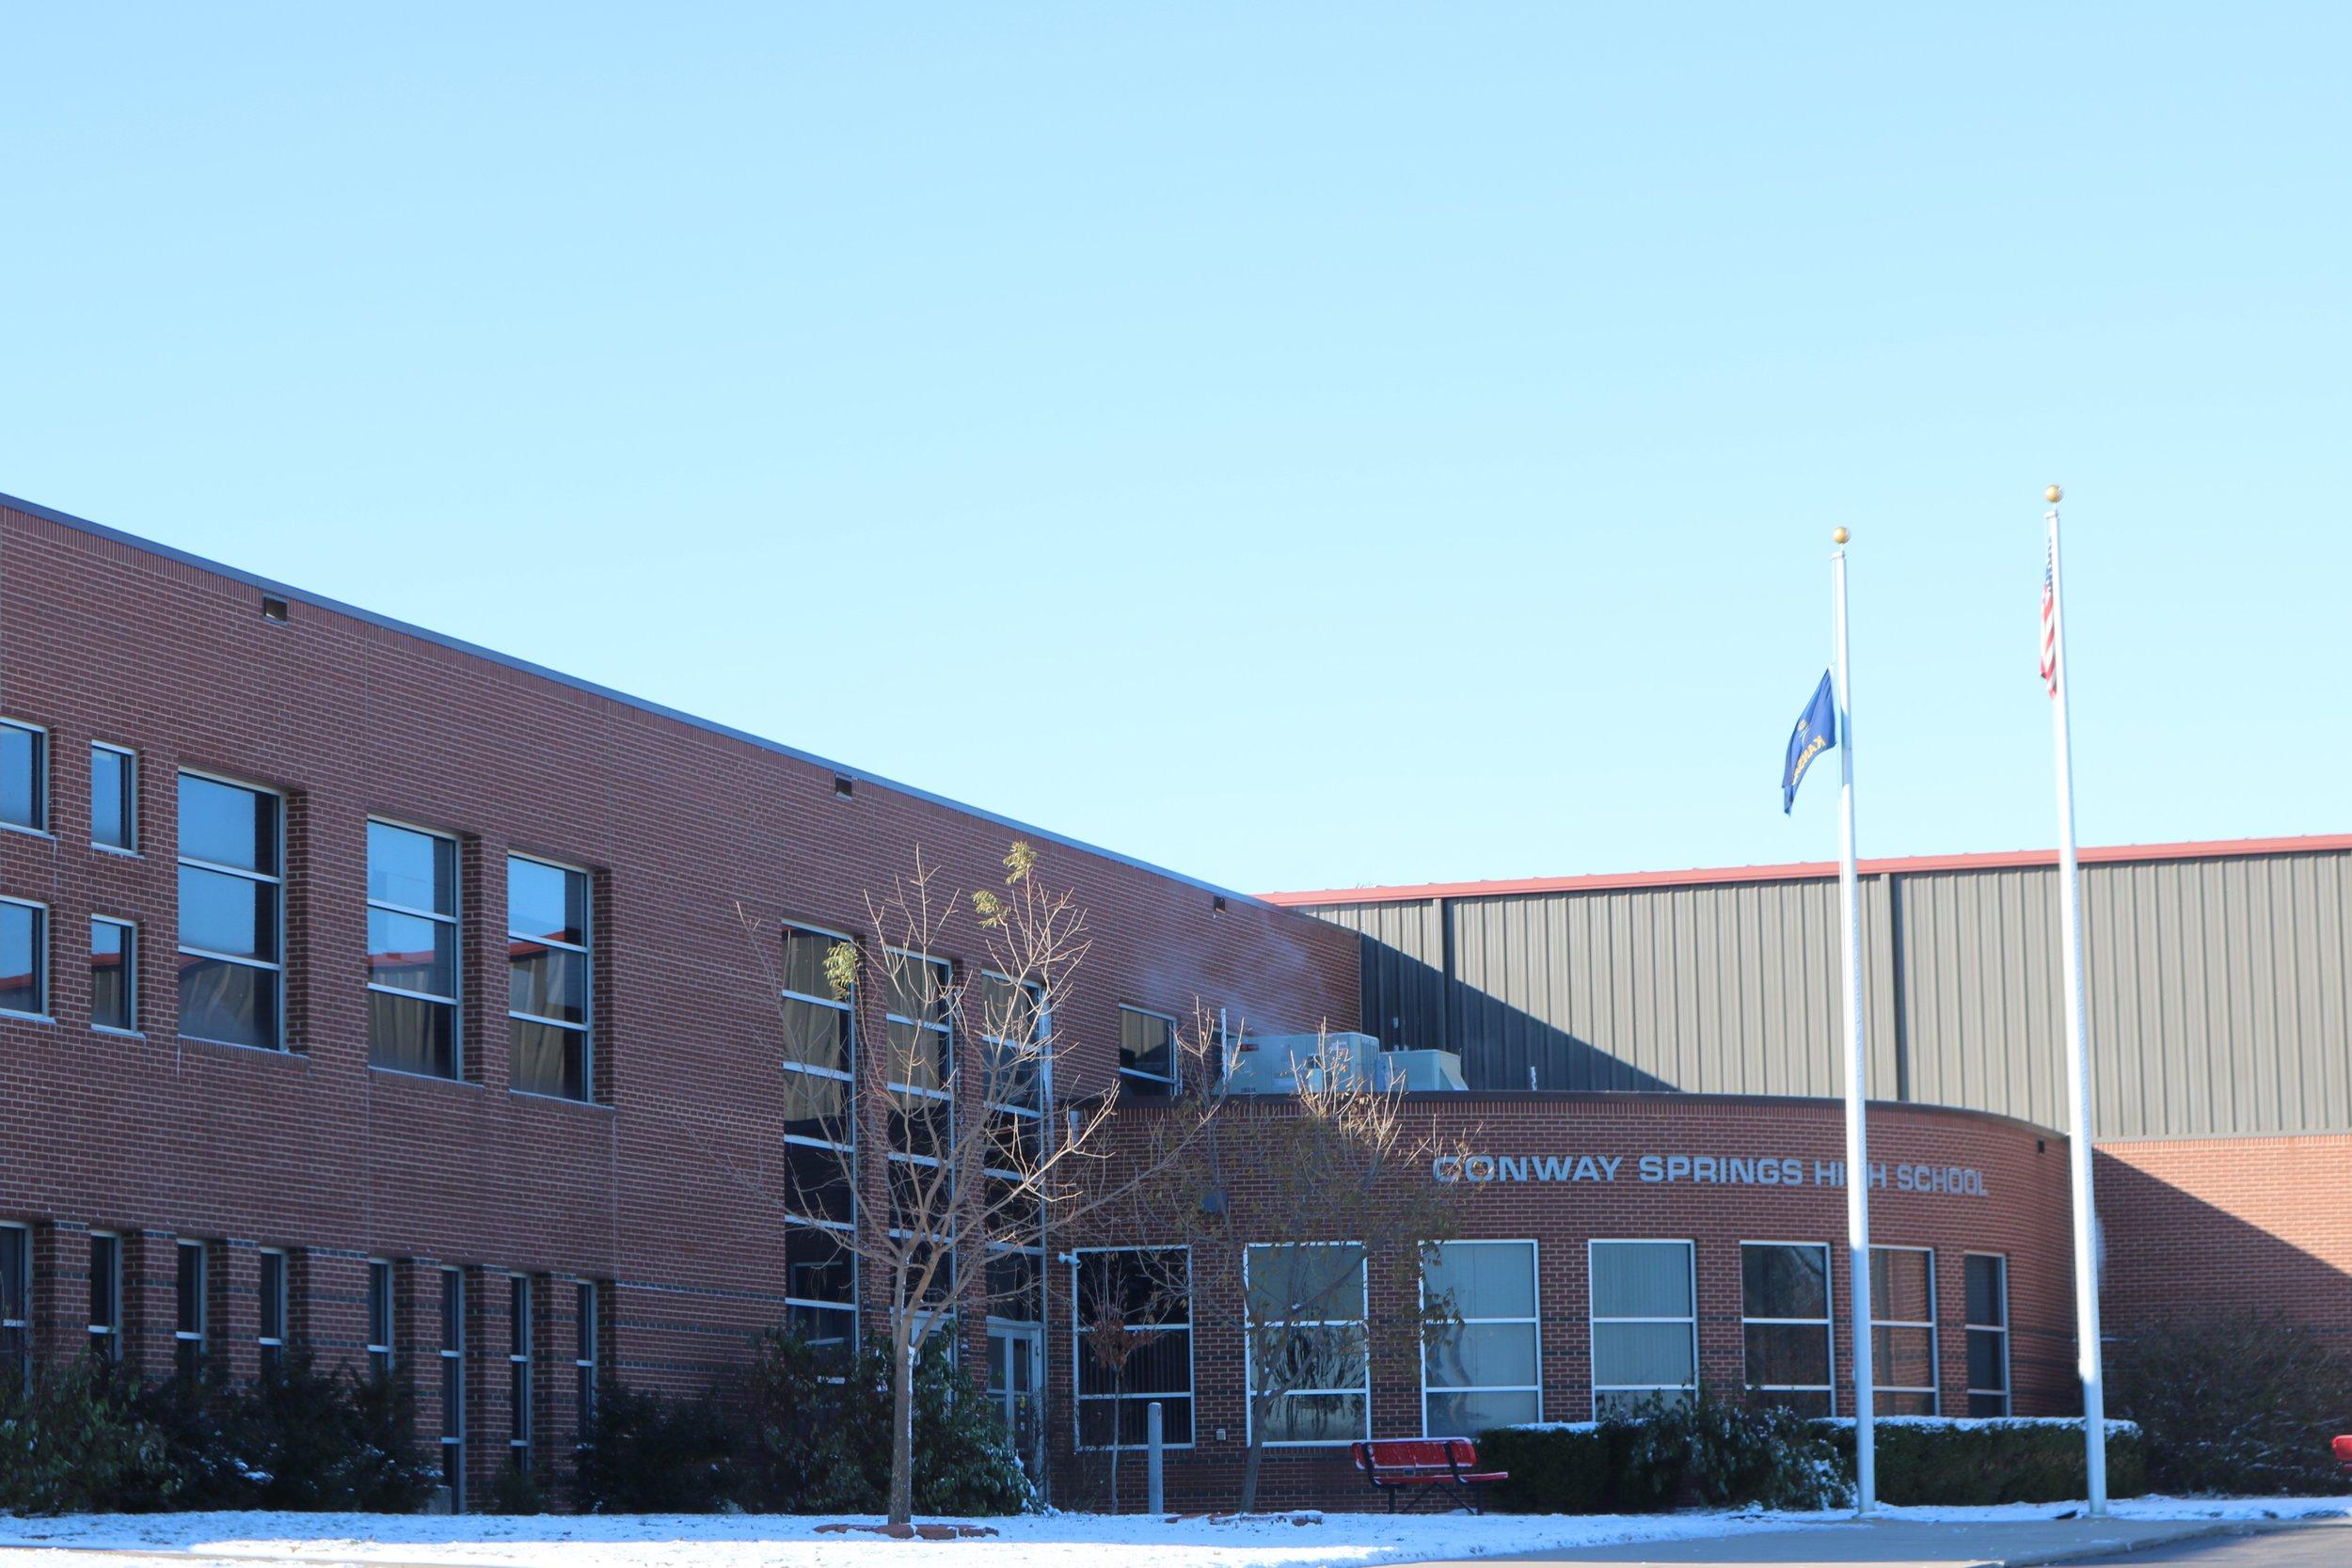 conway springs high school